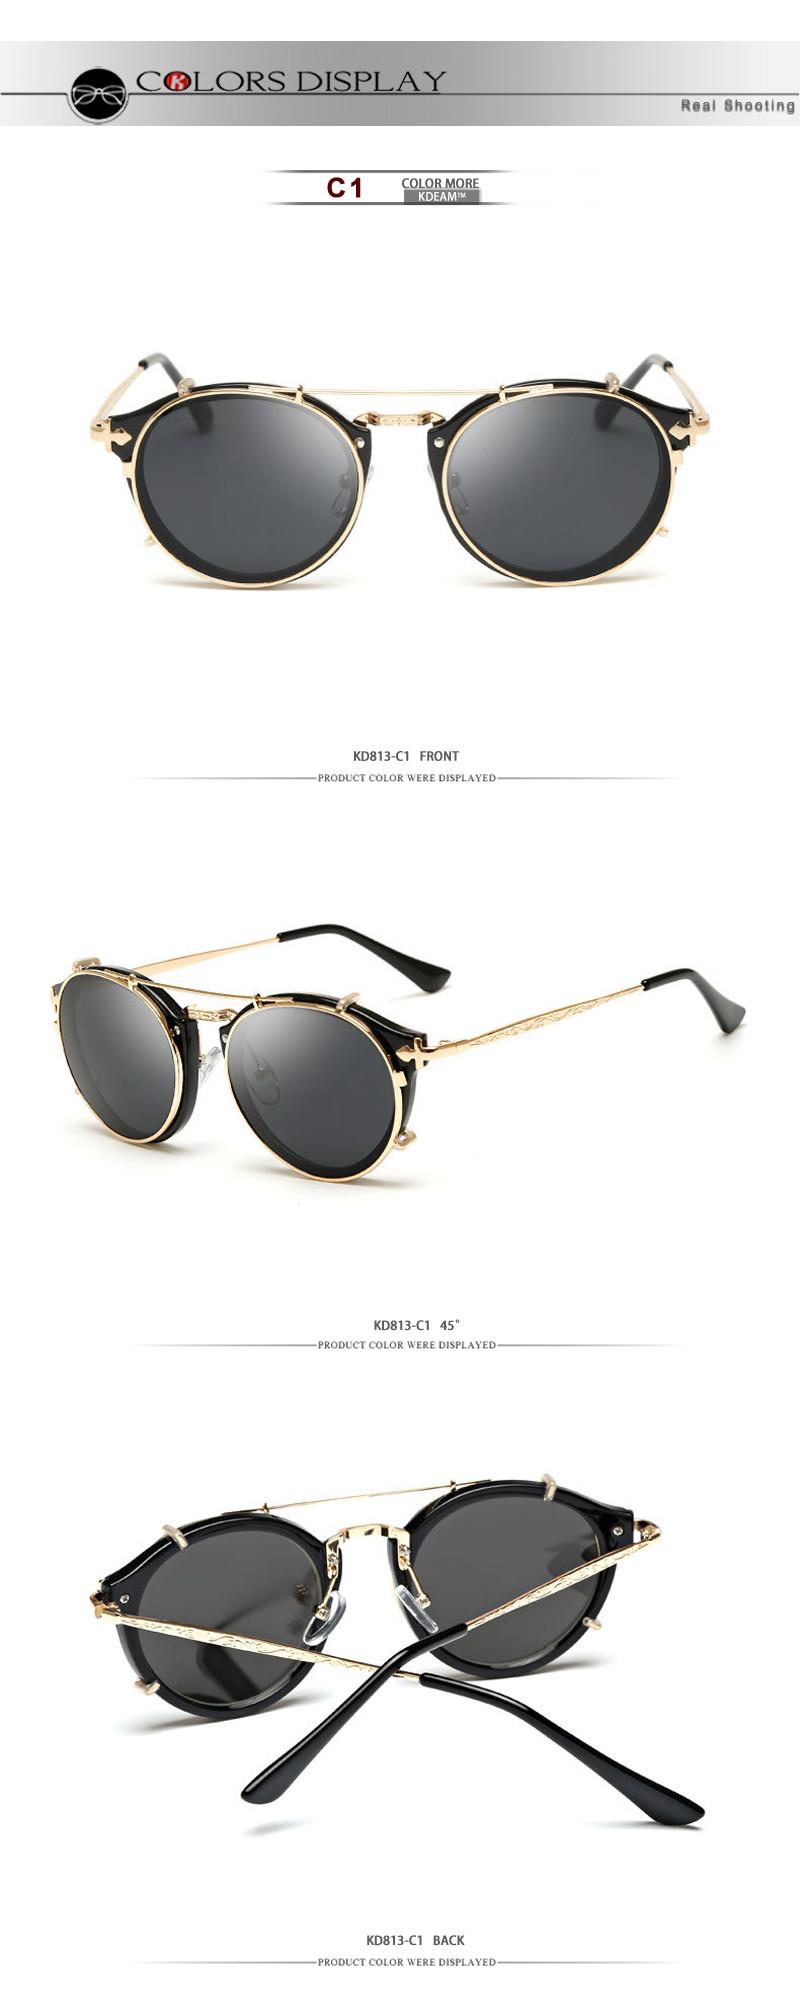 0473080574 Kdeam Happy Clip On Sunglasses Men Removable Round Glasses Women ...